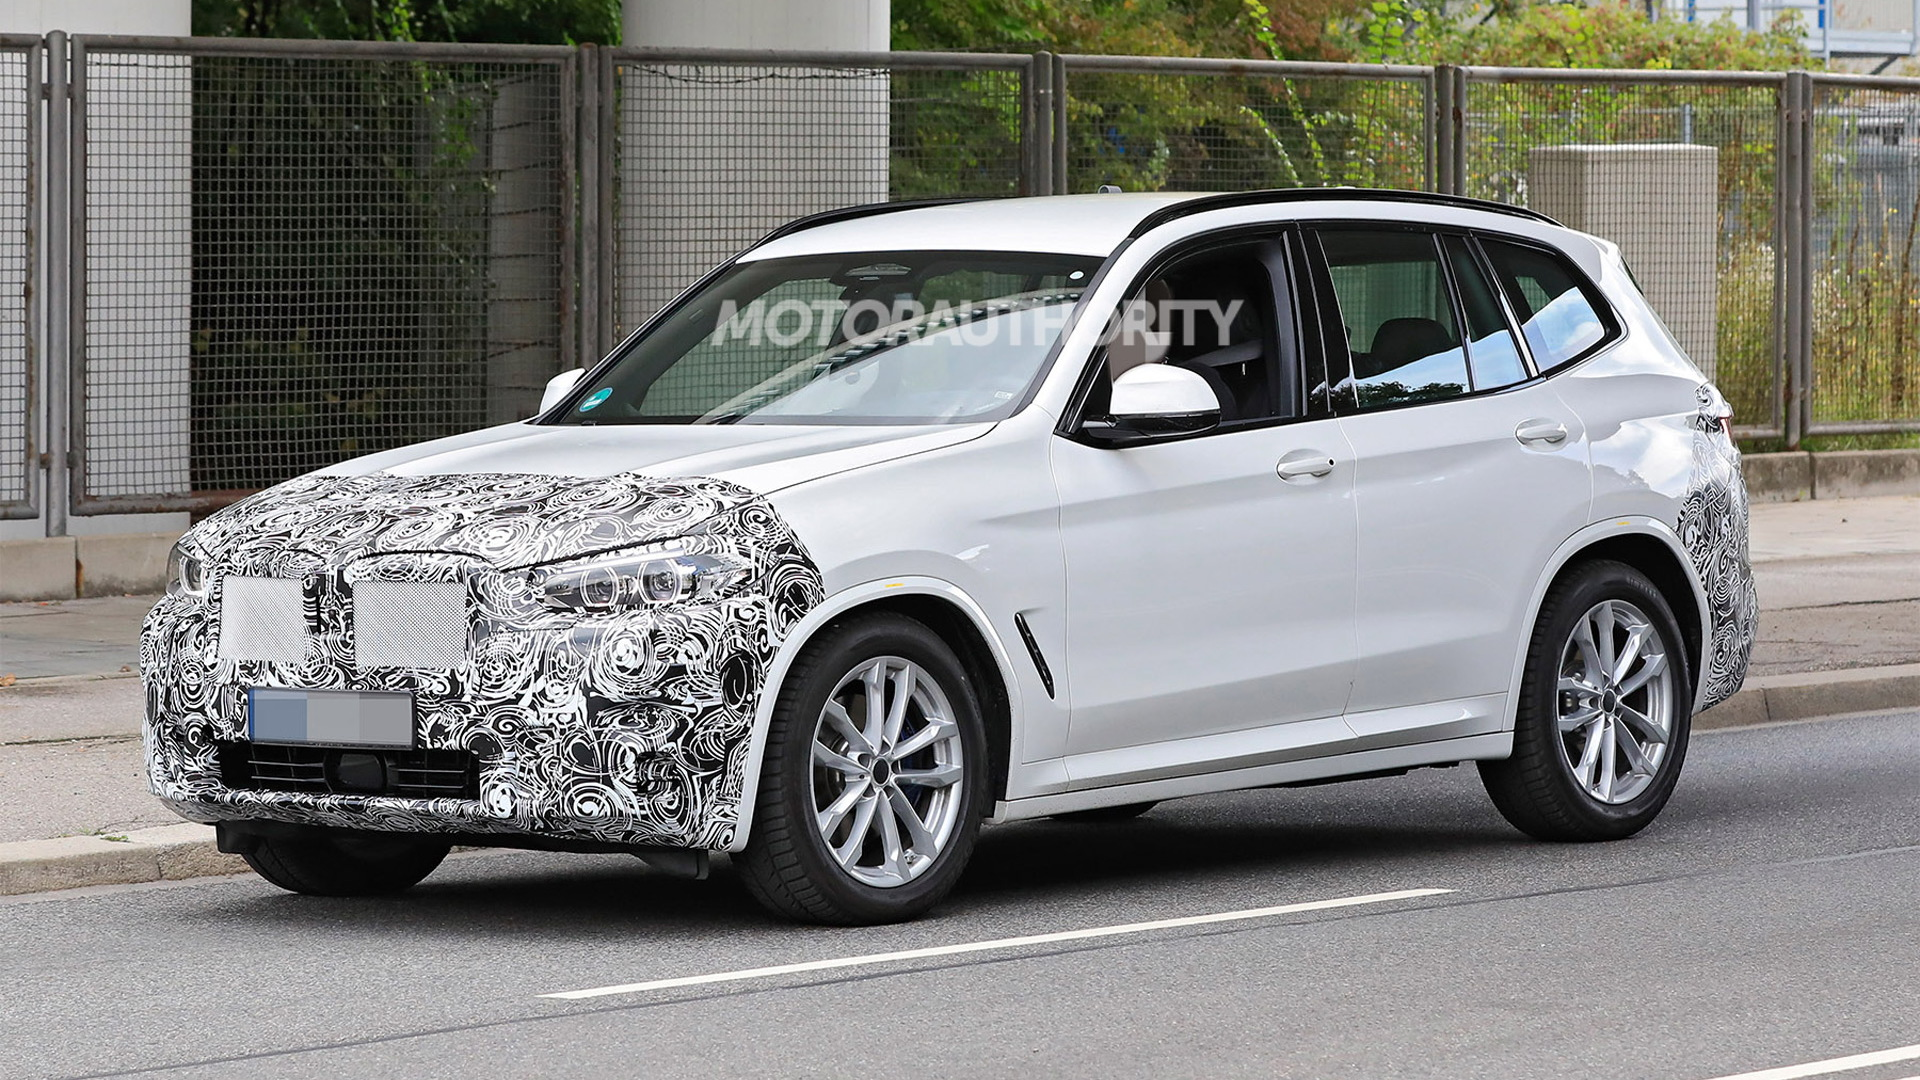 2022 BMW X3 facelift spy shots - Photo credit:S. Baldauf/SB-Medien